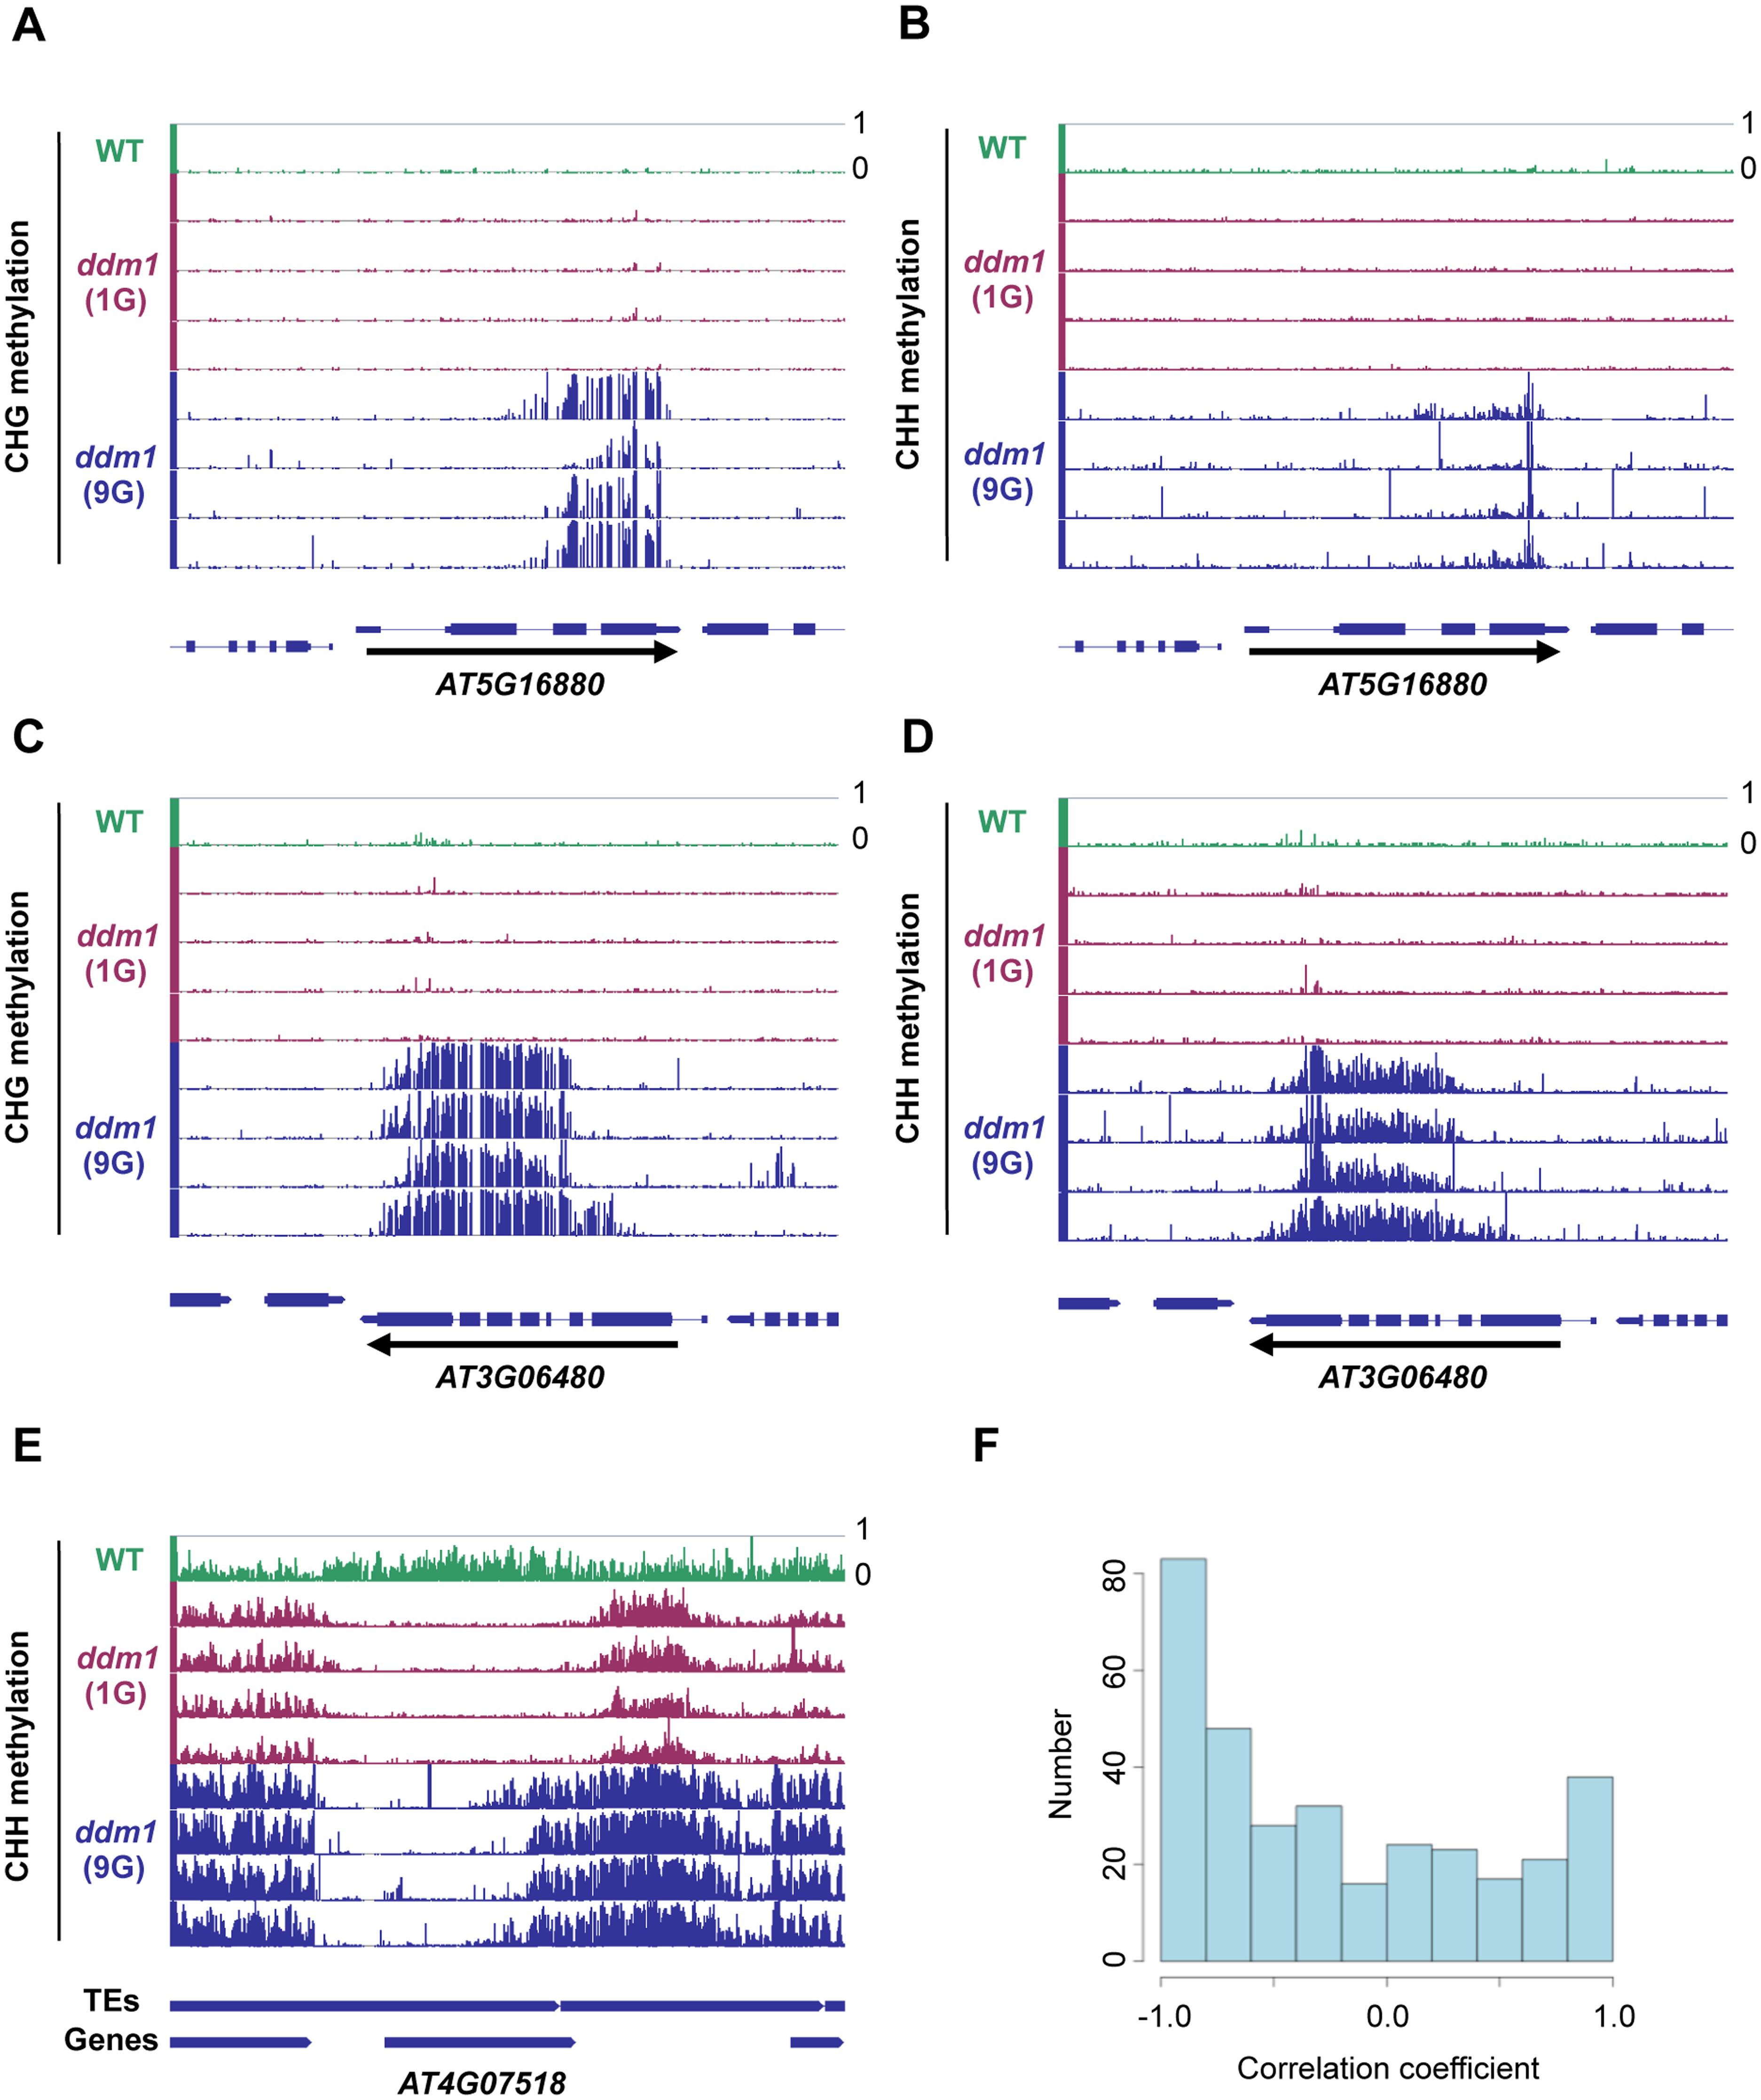 Spread of non-CG methylation in self-pollinated <i>ddm1</i> mutants.